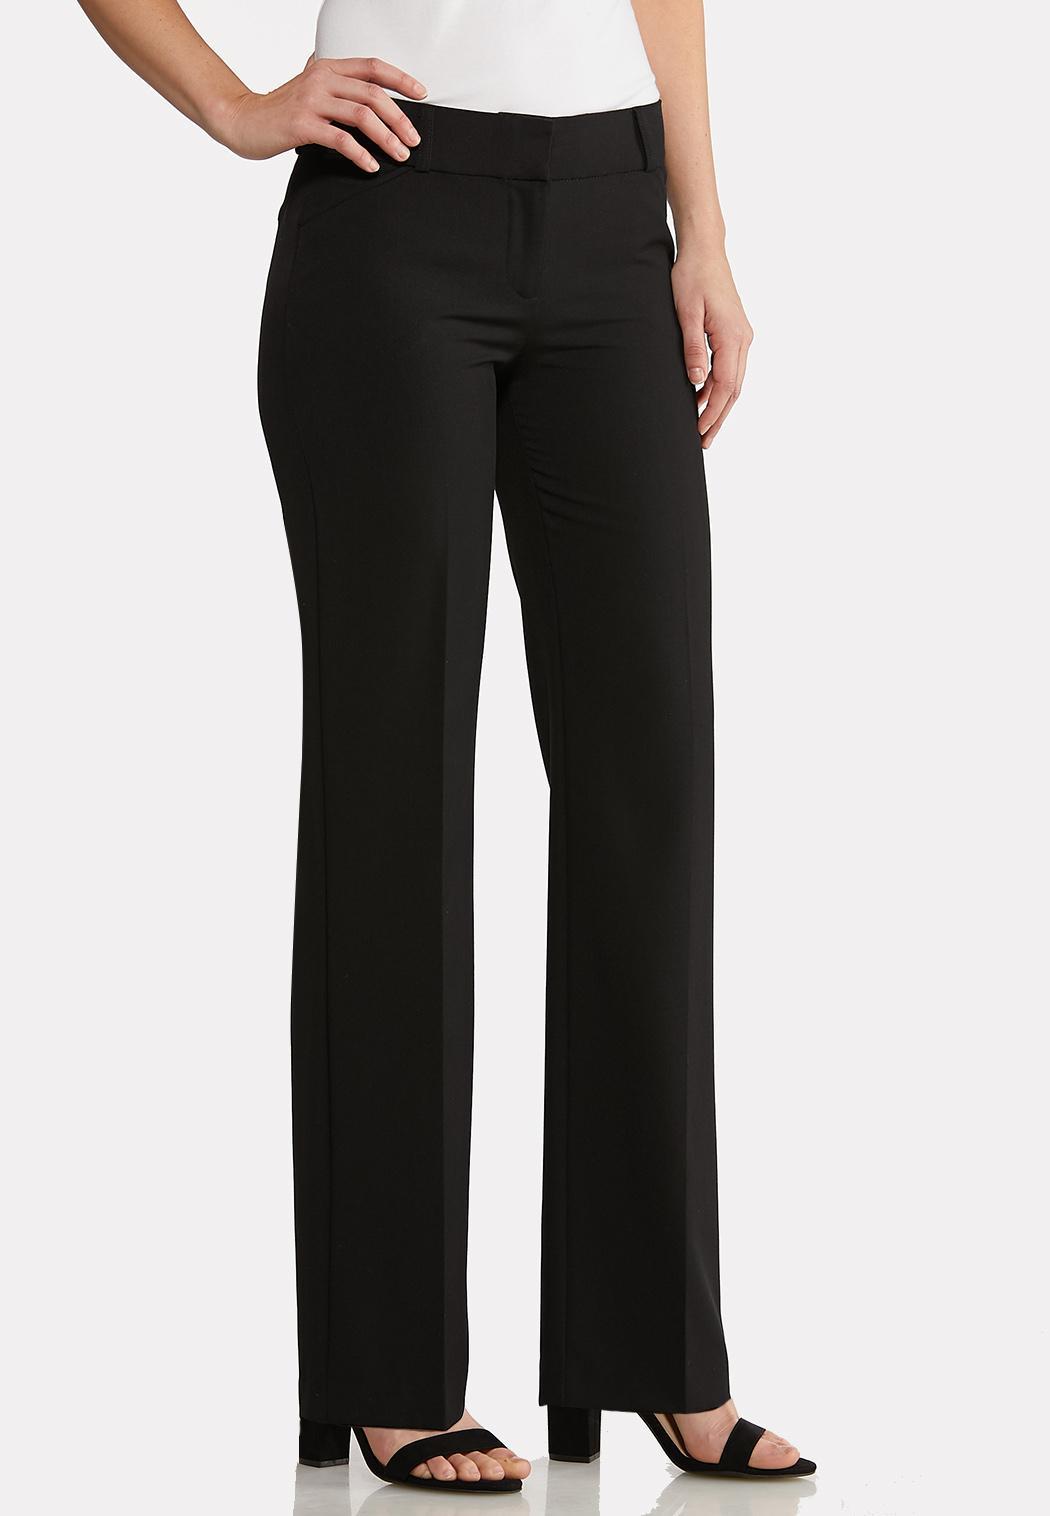 Shape Enhancing Trousers